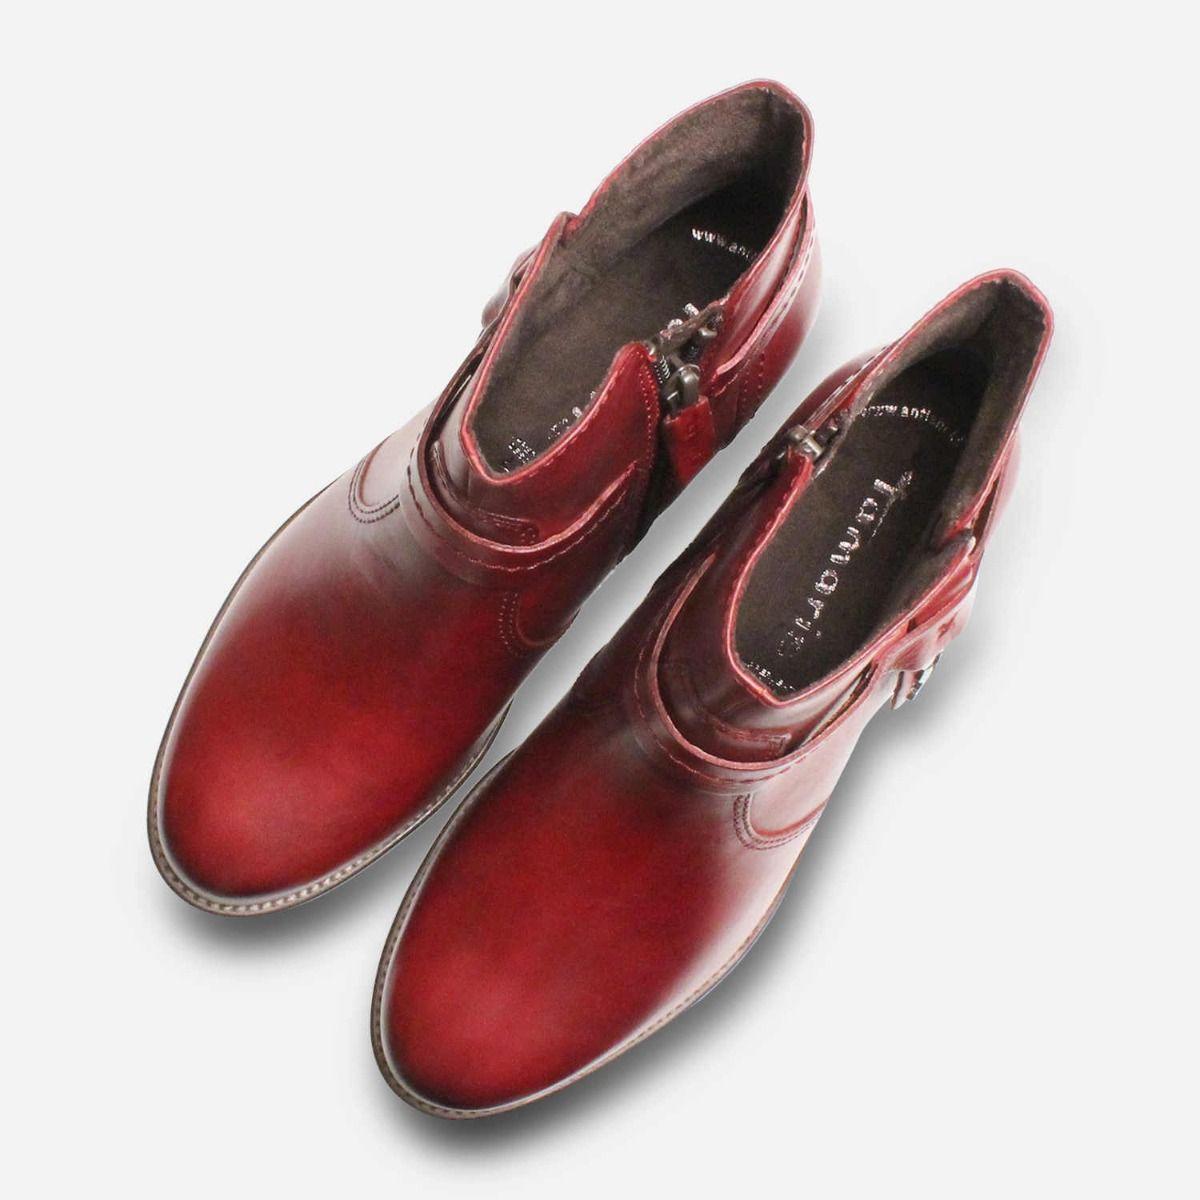 Burgundy Tamaris Ladies Ankle Boots